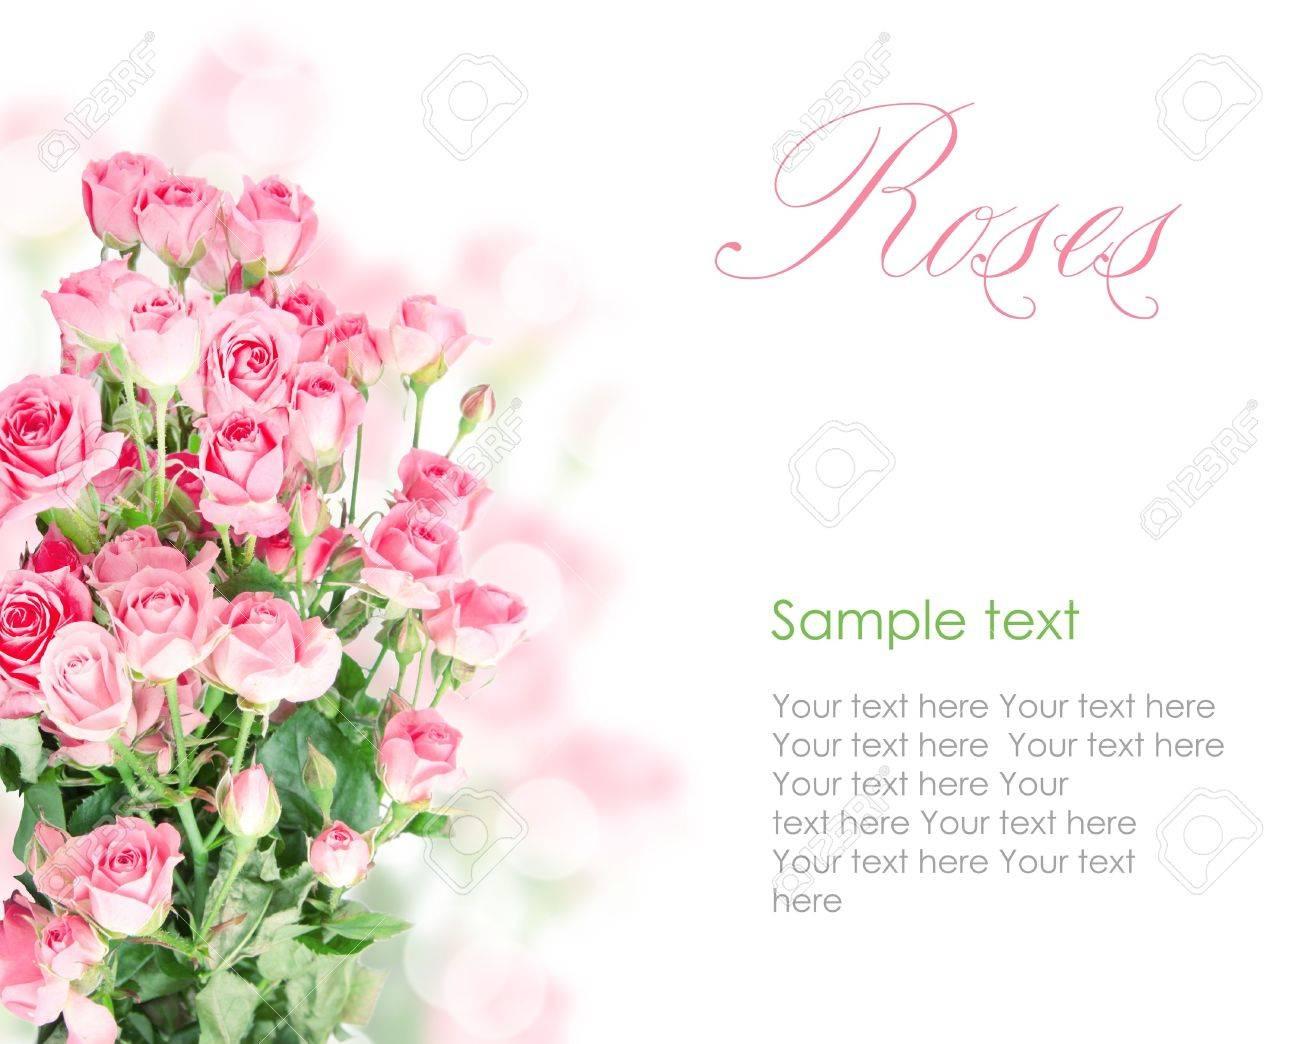 Pink roses postcard design 6(1).jpg Stock Photo - 13057561